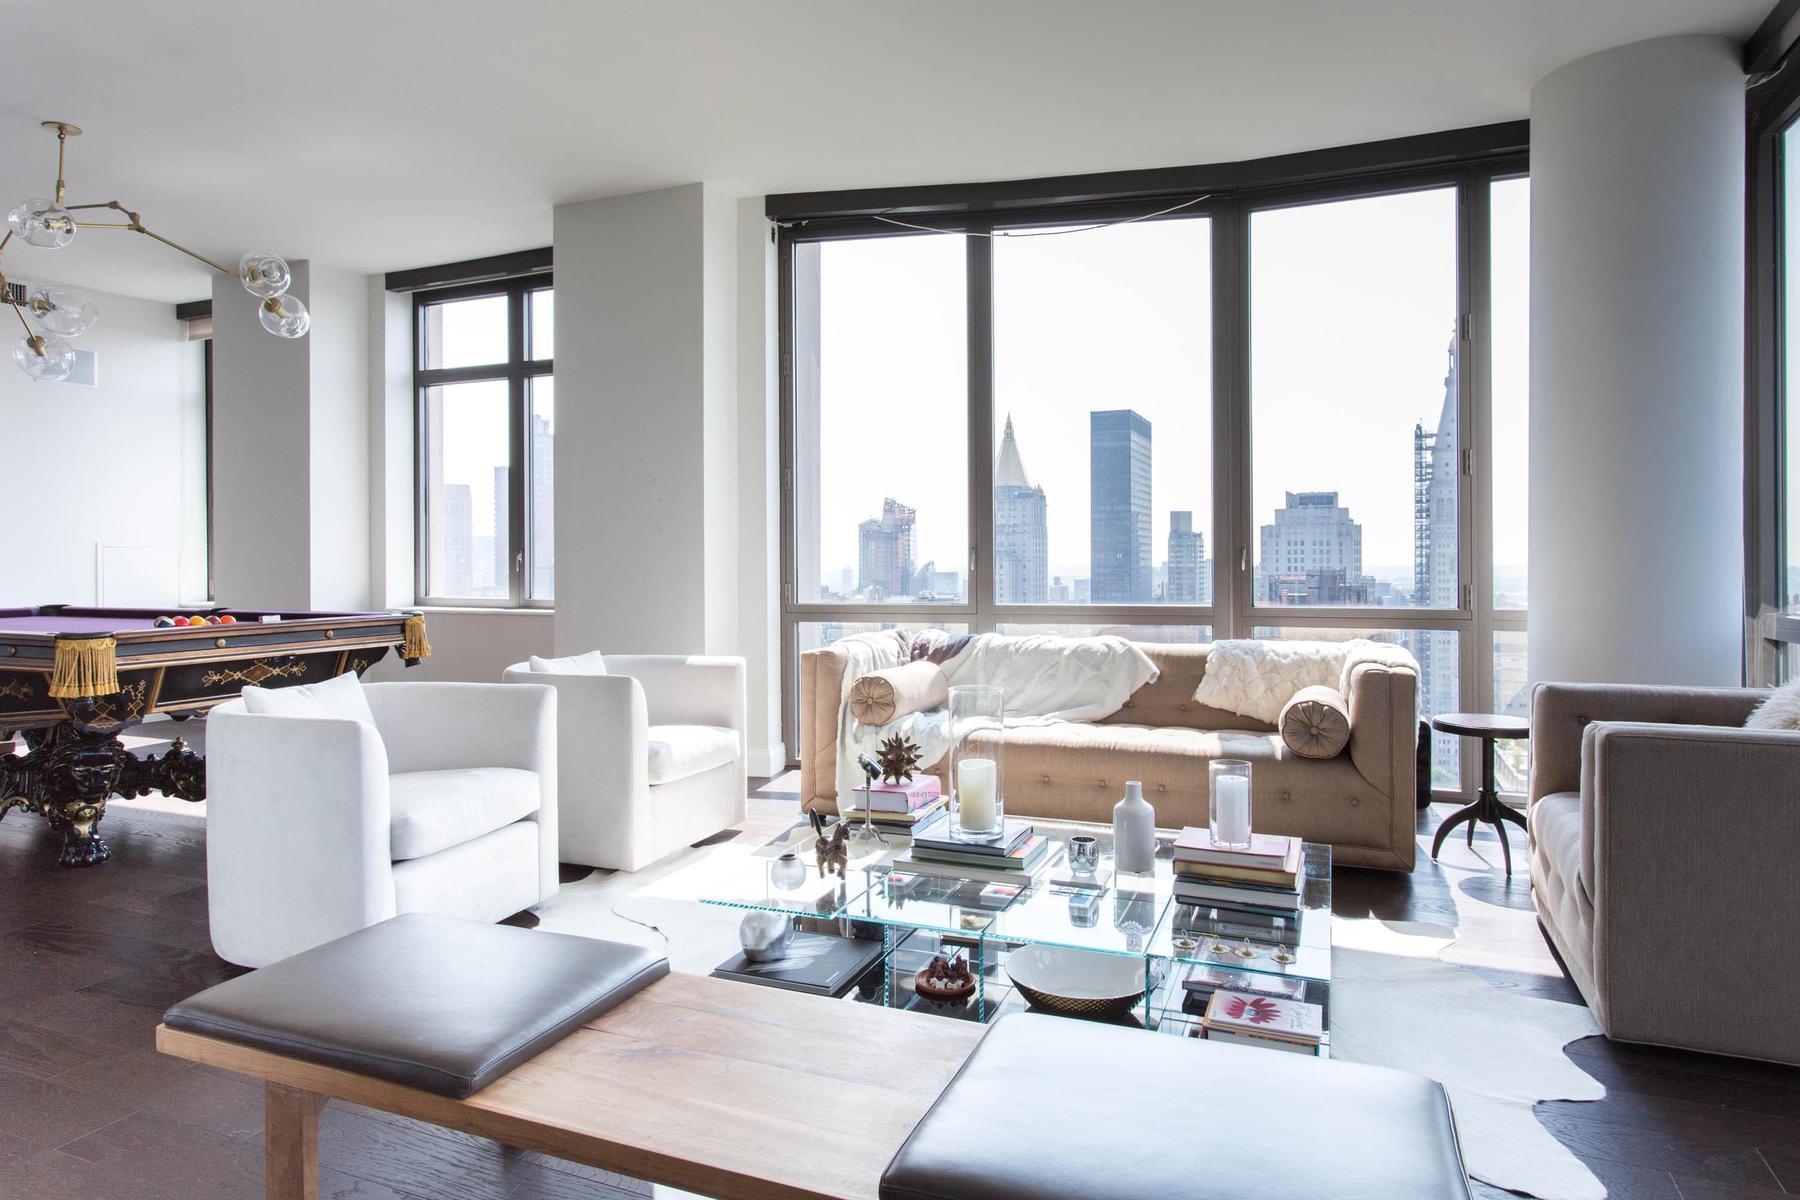 New York - Empire View